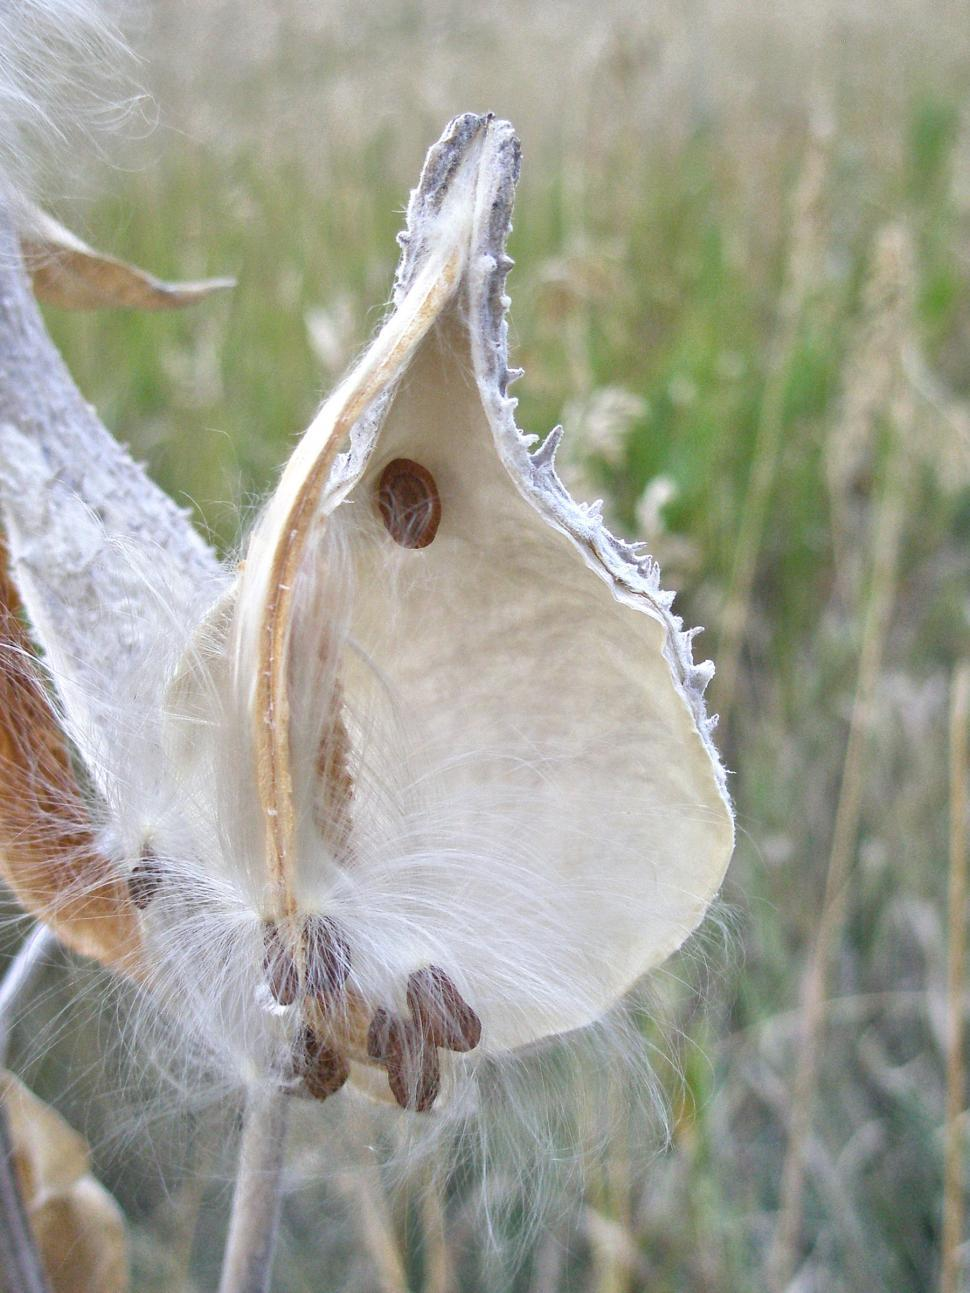 Download Free Stock HD Photo of Milkweed Seeds Empty Pod Online